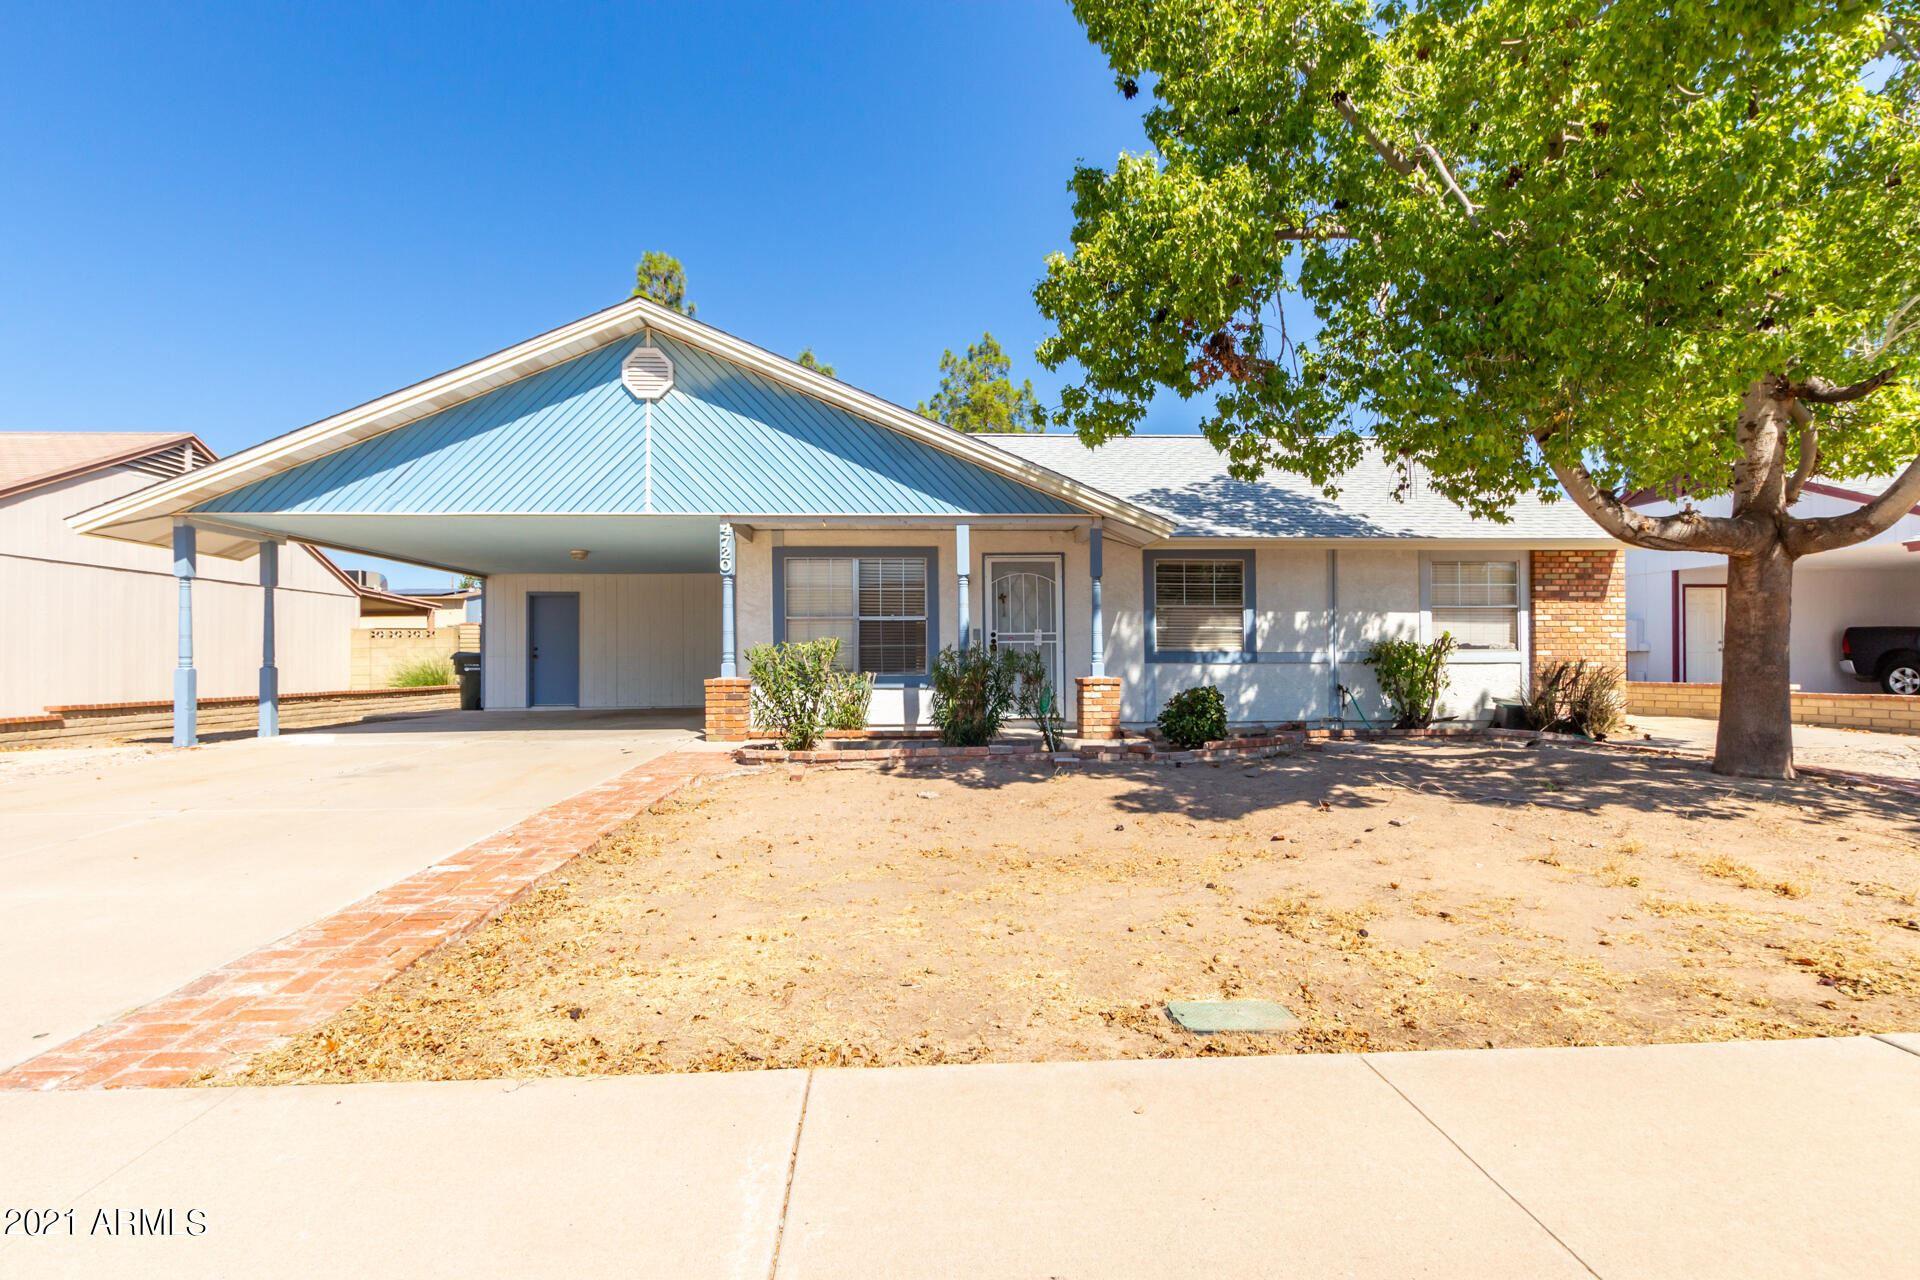 4720 W WAGONER Road, Glendale, AZ 85308 - MLS#: 6295227